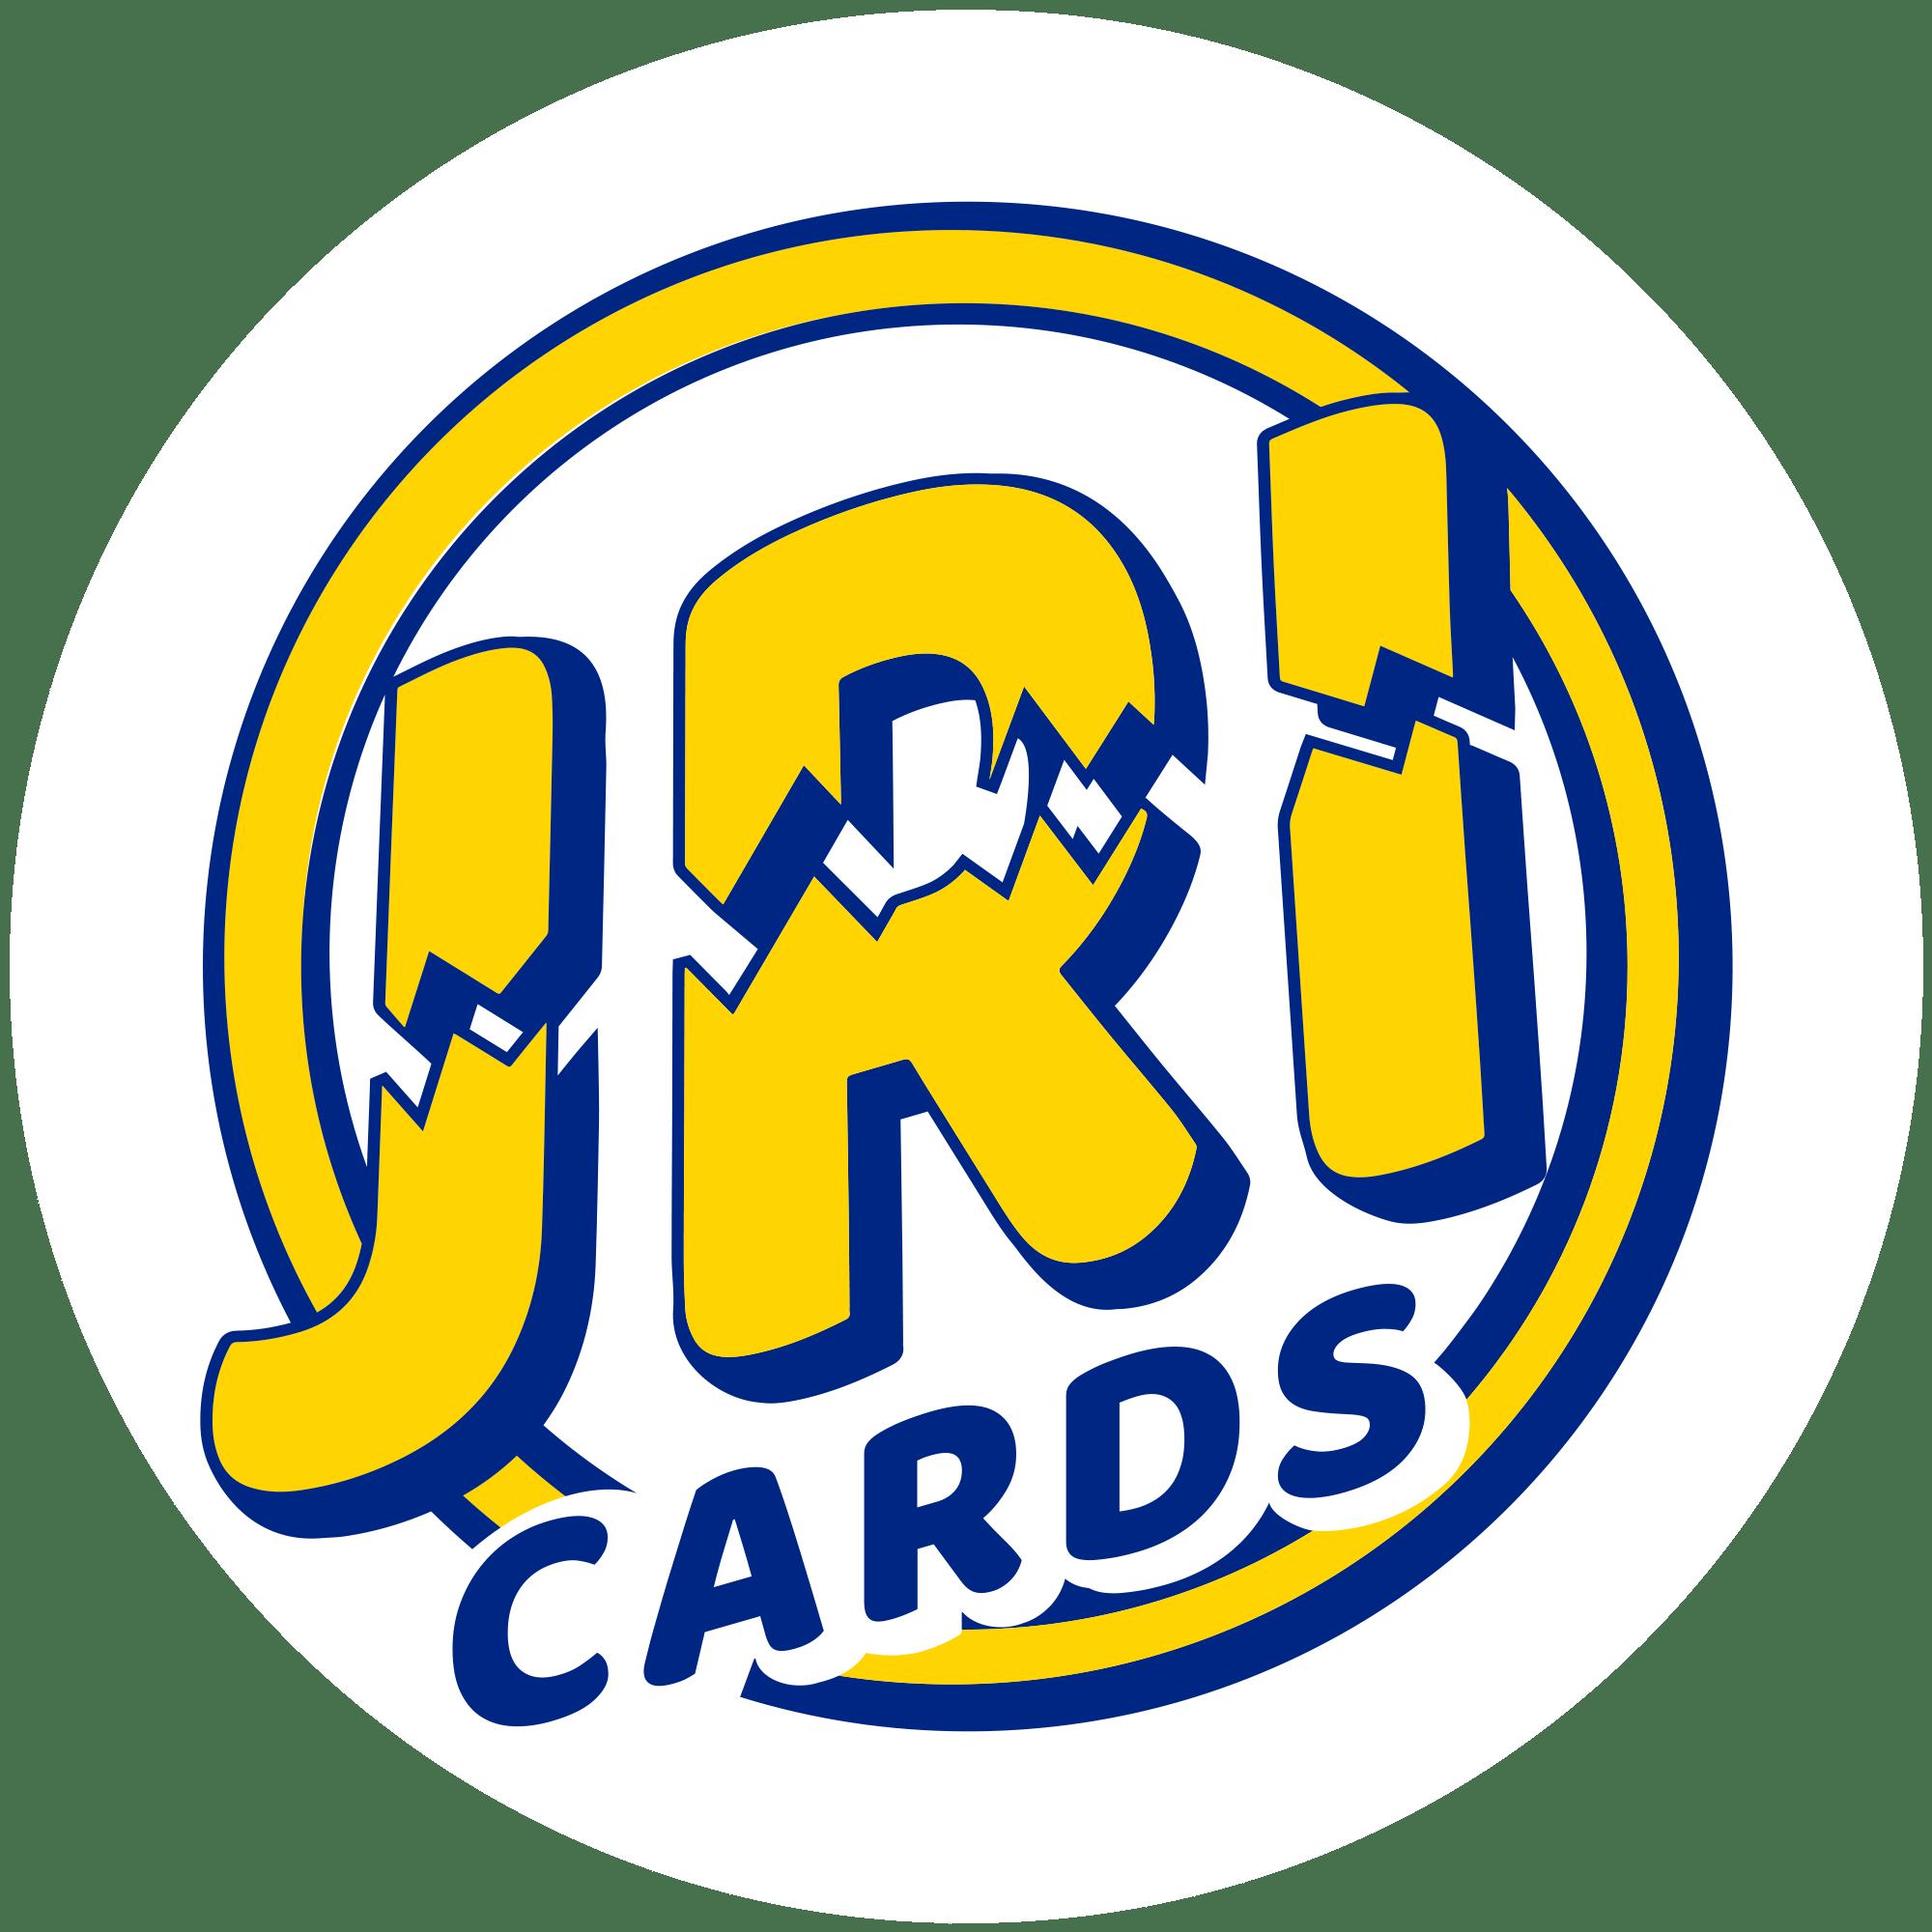 2020 PANINI CONTENDERS FOOTBALL HOBBY BOX (18 PACKS AVAILABLE)